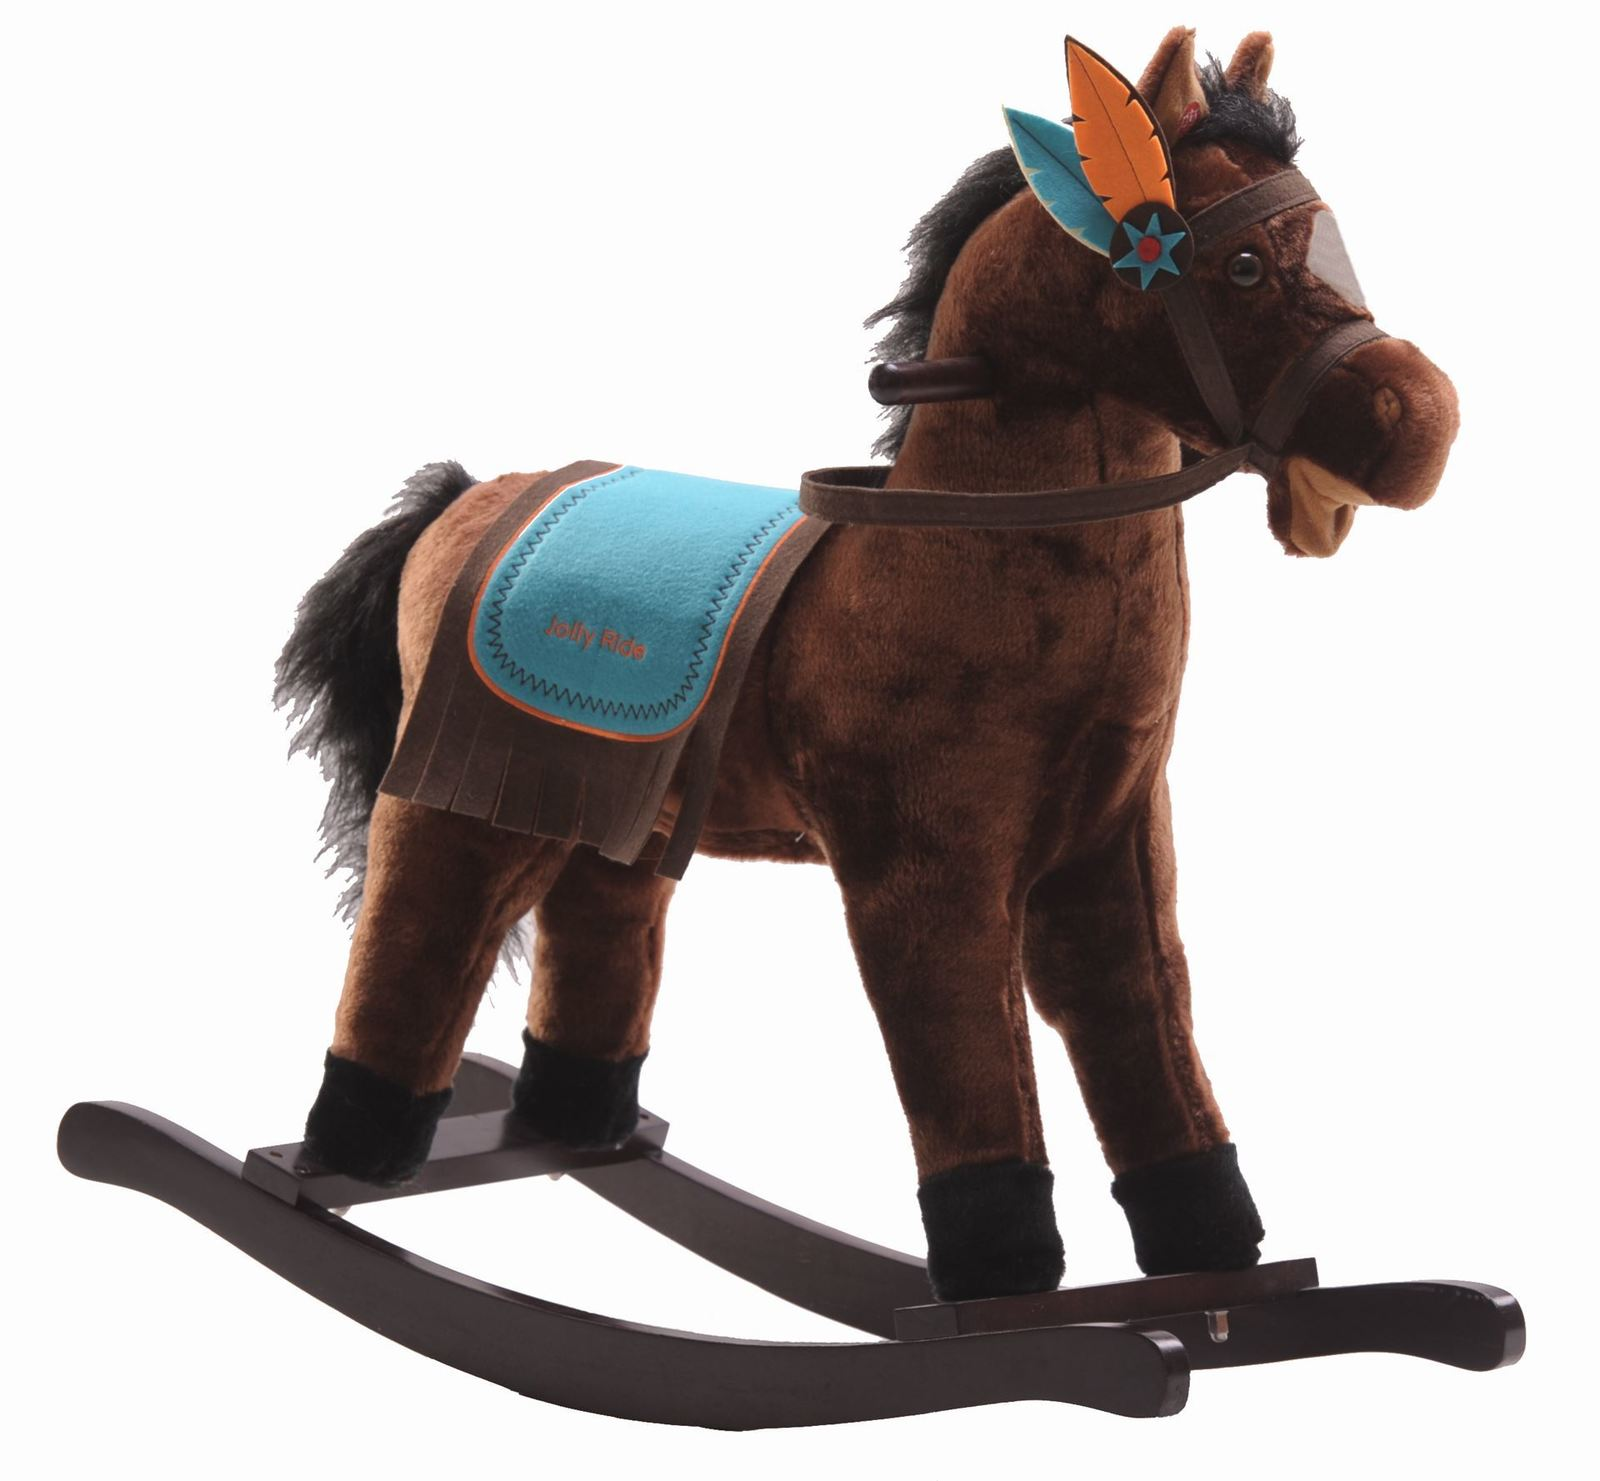 Jolly Ride: Rocking Horse - Western Style image